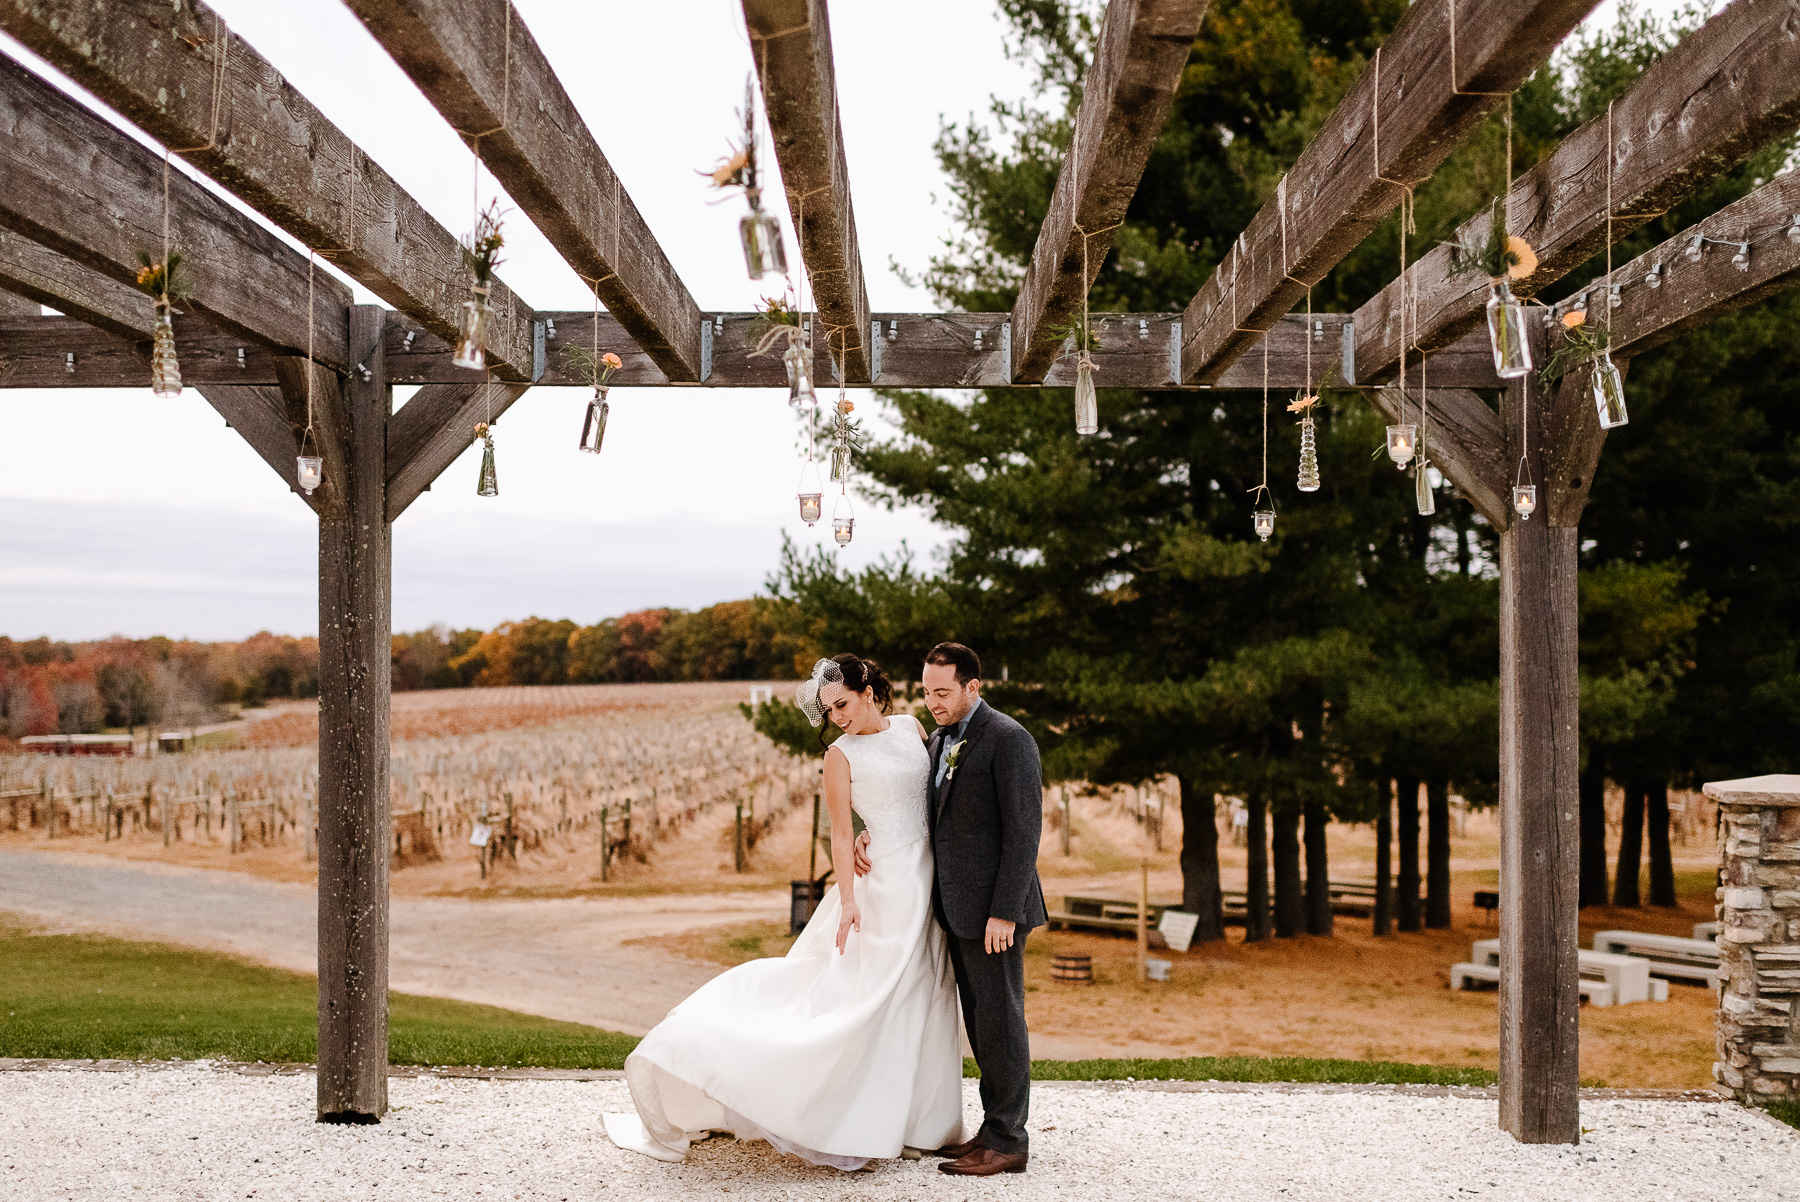 91-Laurita Winery Wedding New Jersey Wedding Photographer Laurita Winery Weddings Longbrook Photography.jpg